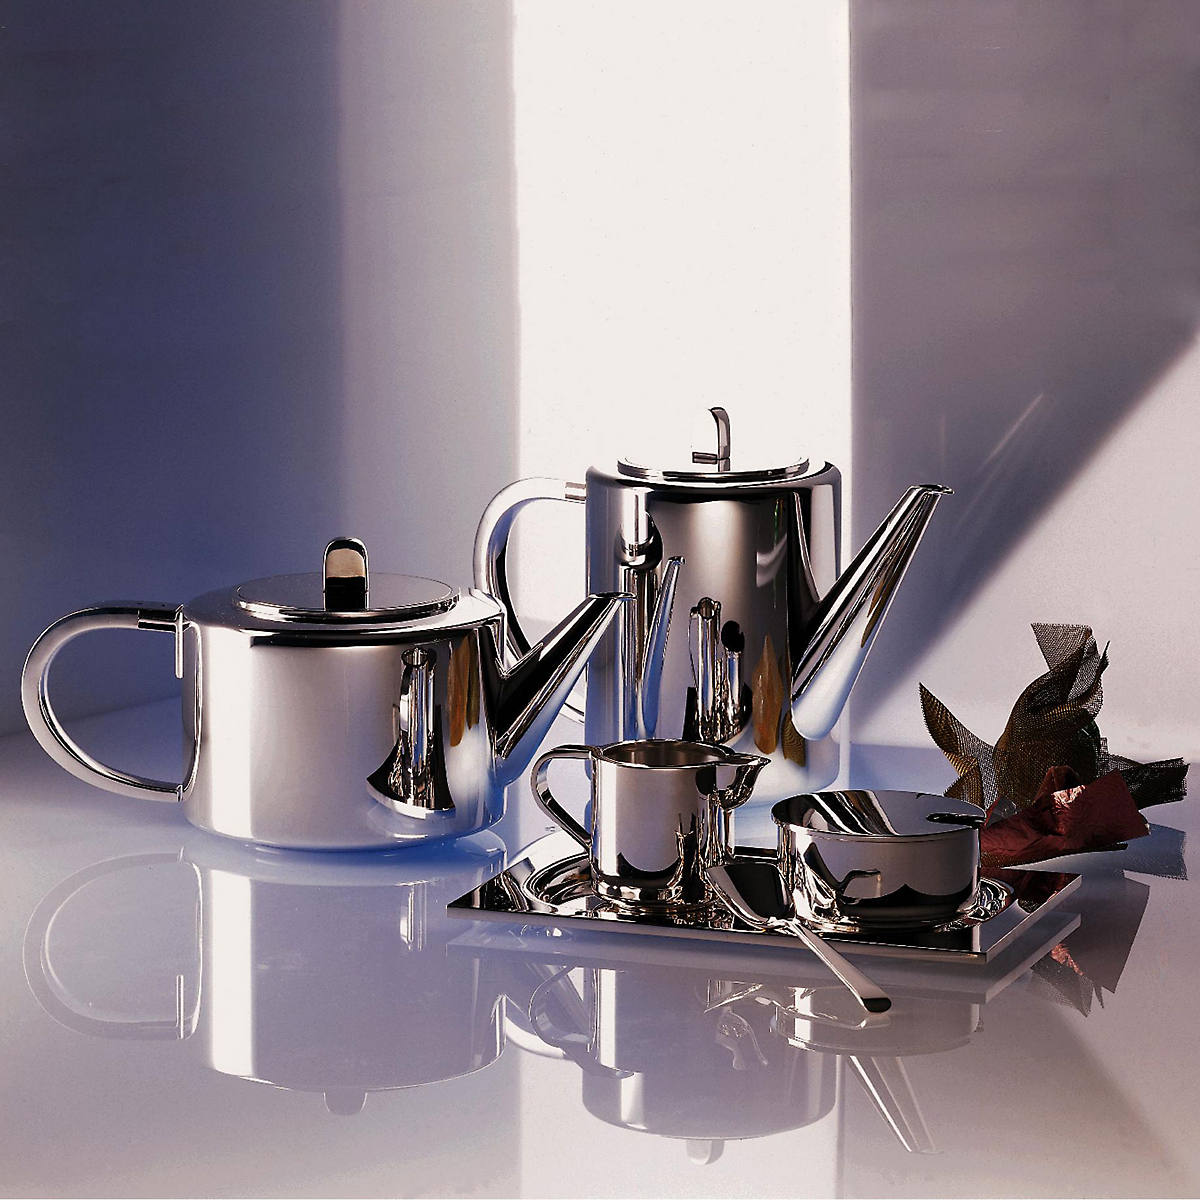 robbe berking alta silverplate coffee tea service gump 39 s. Black Bedroom Furniture Sets. Home Design Ideas